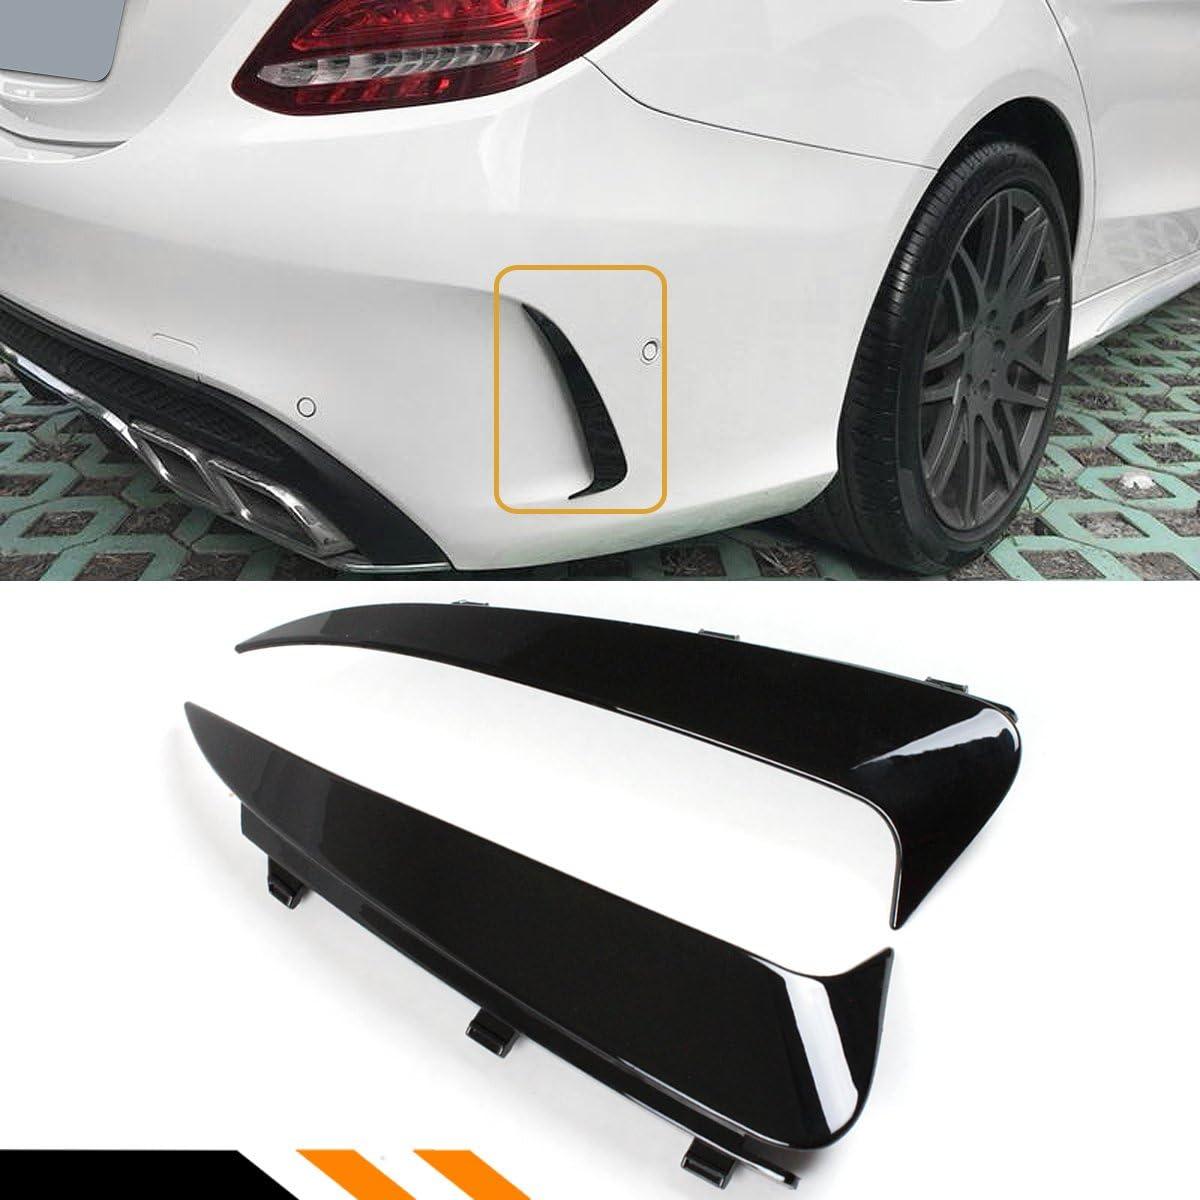 Fits for 2015-2018 Mercedes Benz W205 C450 High order Door AMG Be super welcome 4 C43 Se C63